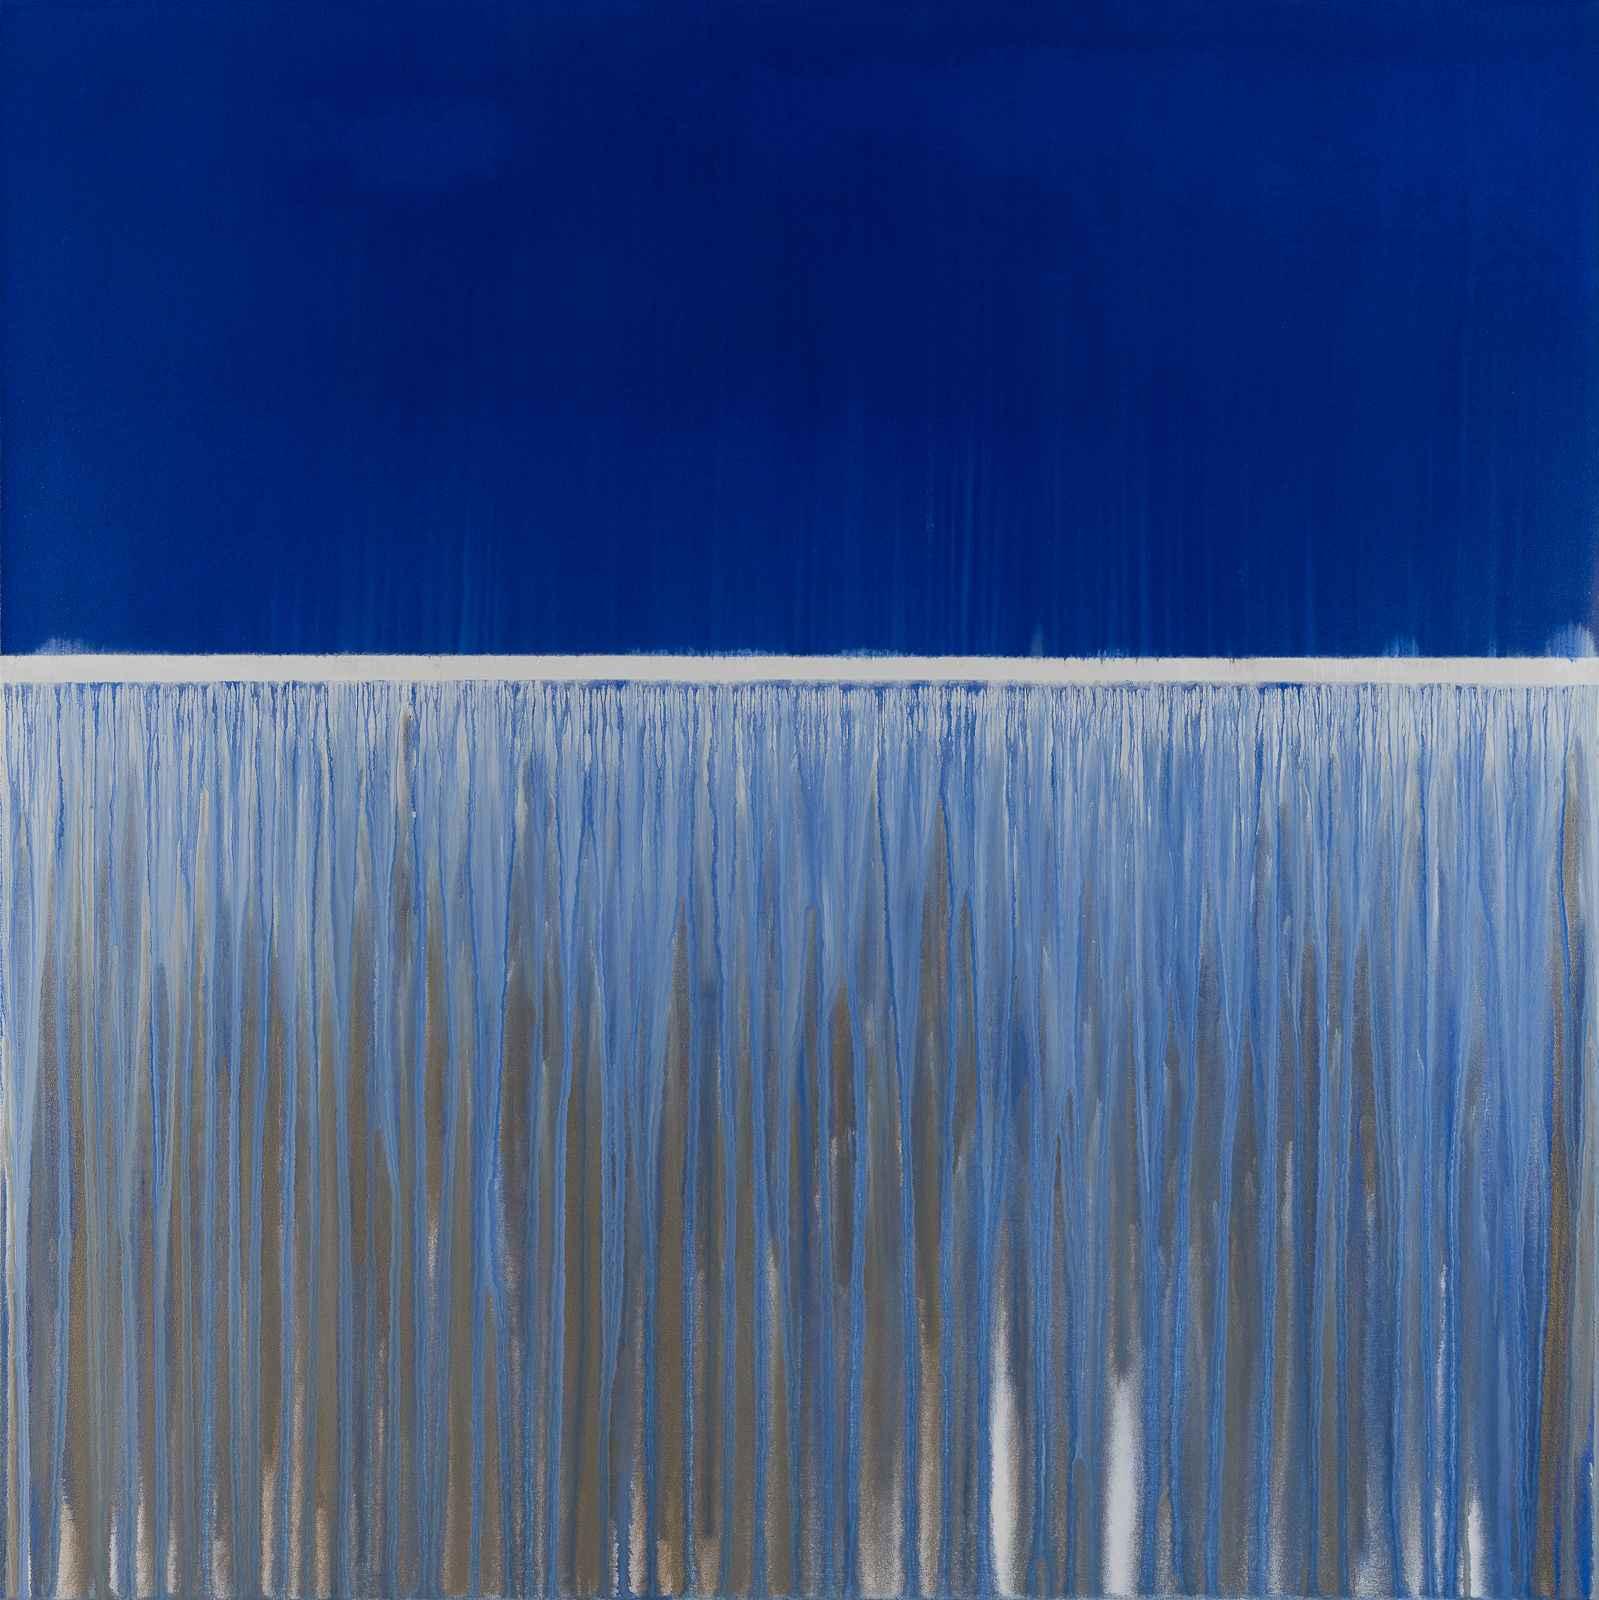 SUPERNATANT by Mr. JUAN ALONSO-RODRIGUEZ - Masterpiece Online